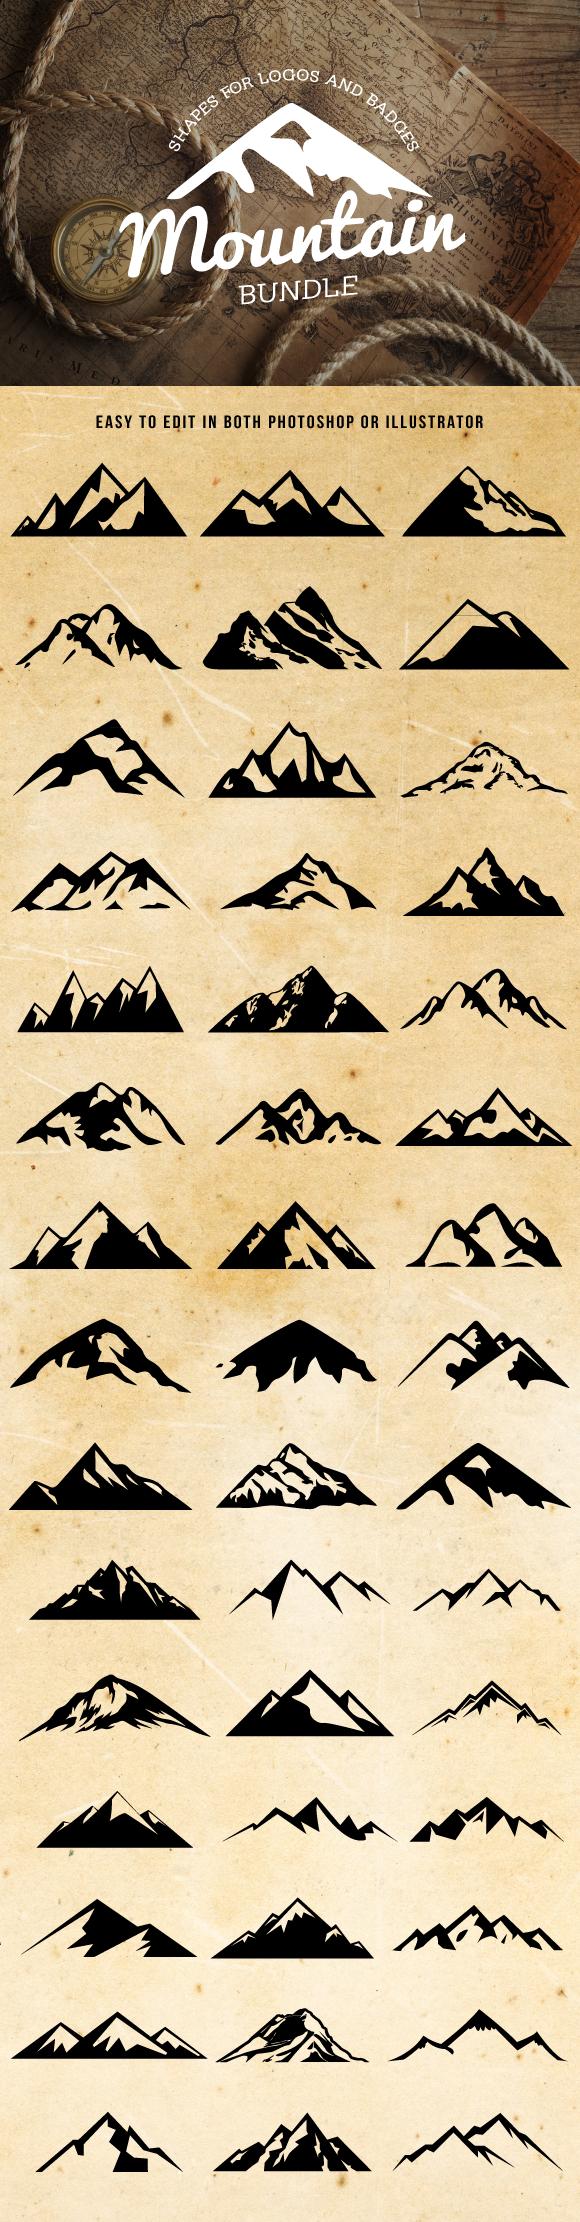 Mountain shapes for logos bundle vector shapes adobe illustrator